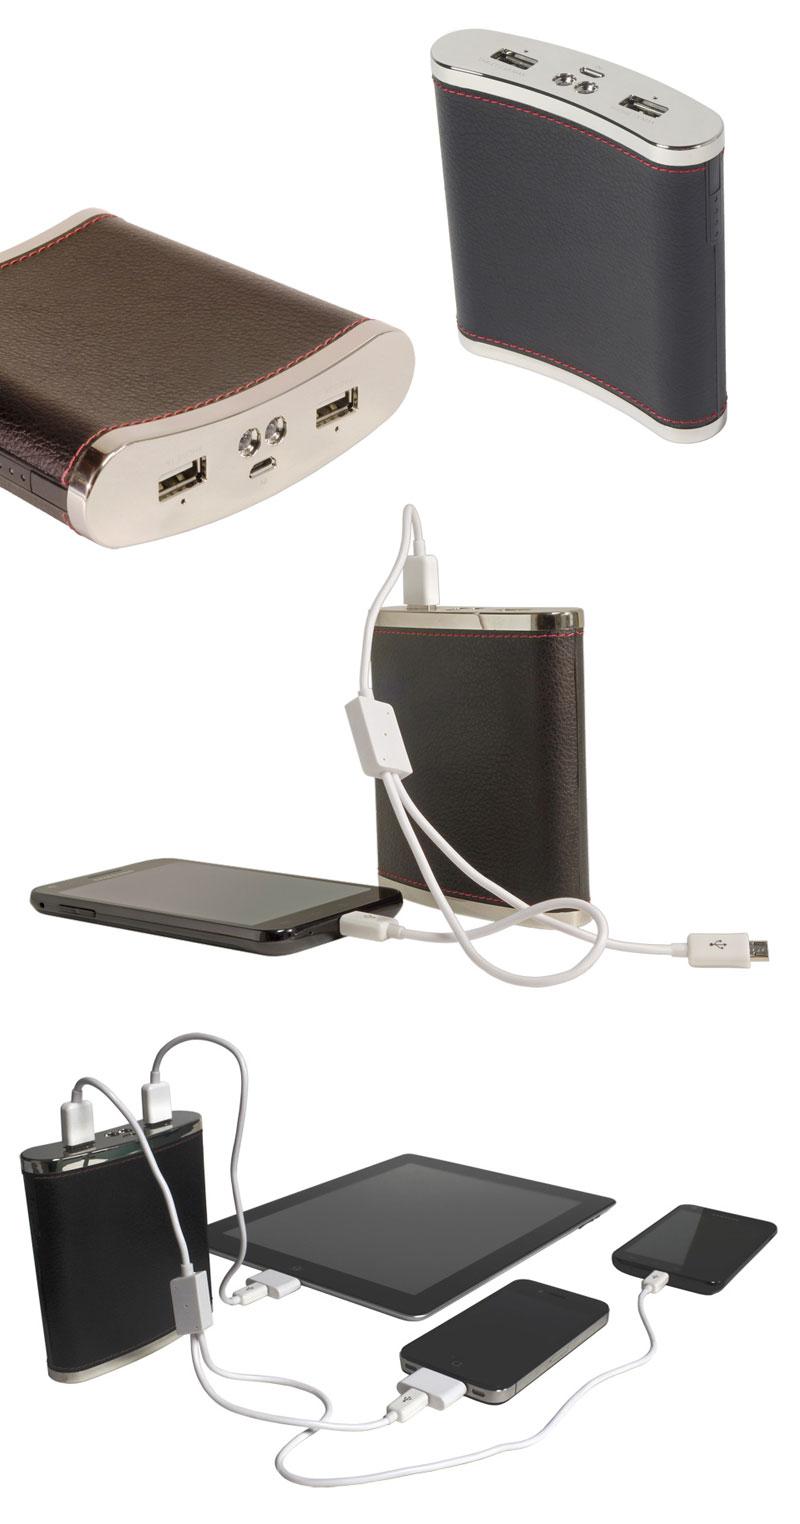 awesome-design-ideas-PowerFlask-Digital-Treasures-2